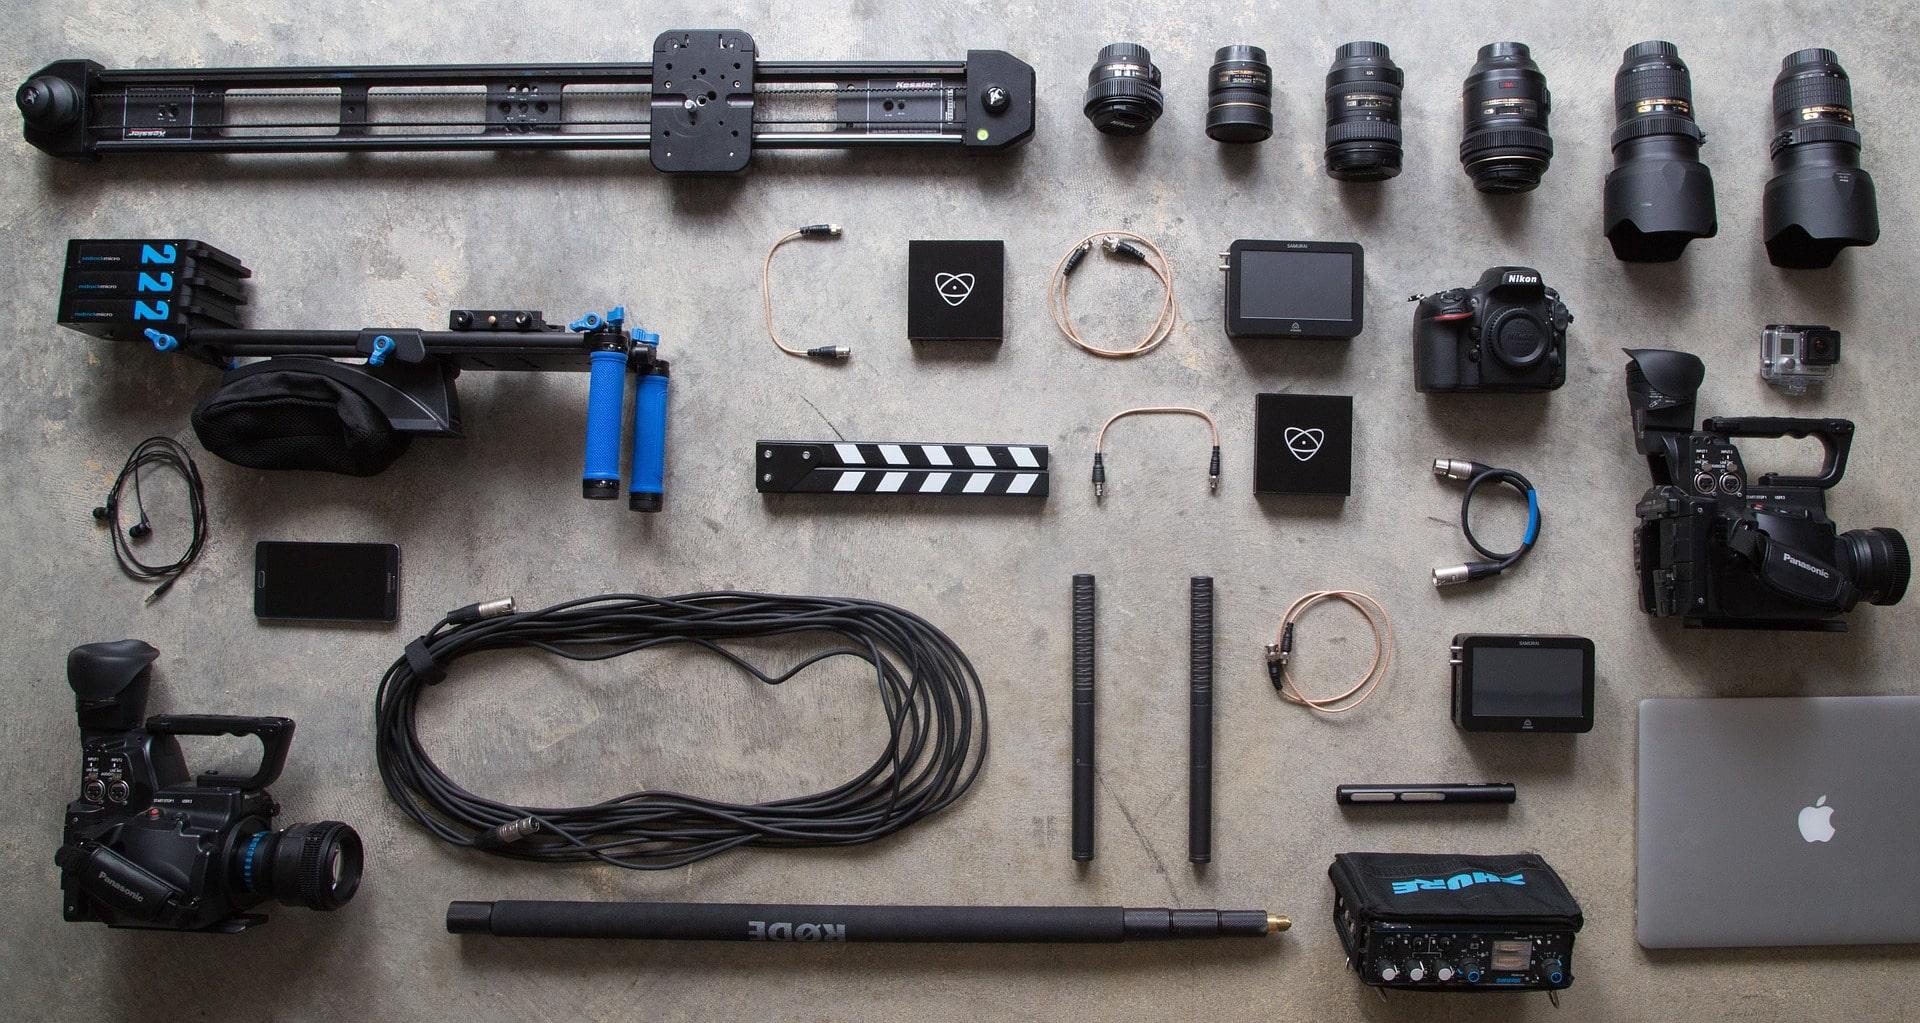 Accesorios cámara de vídeo